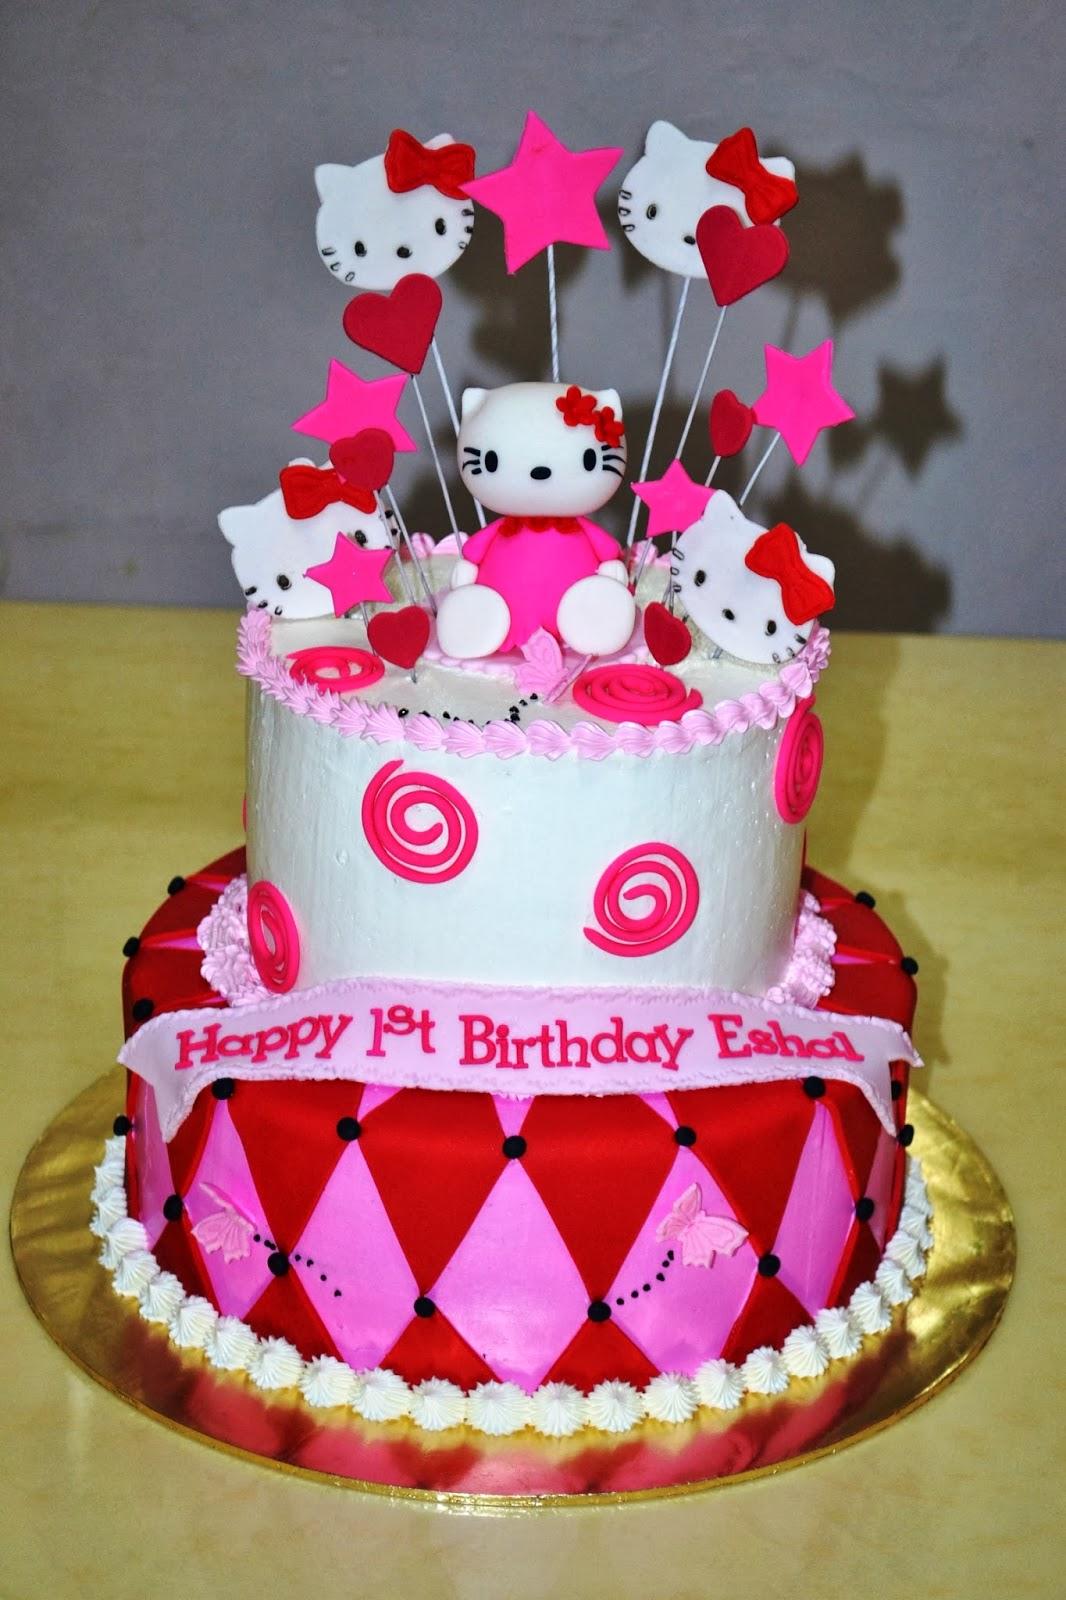 Mypu3 Cake House Hello Kitty Cake